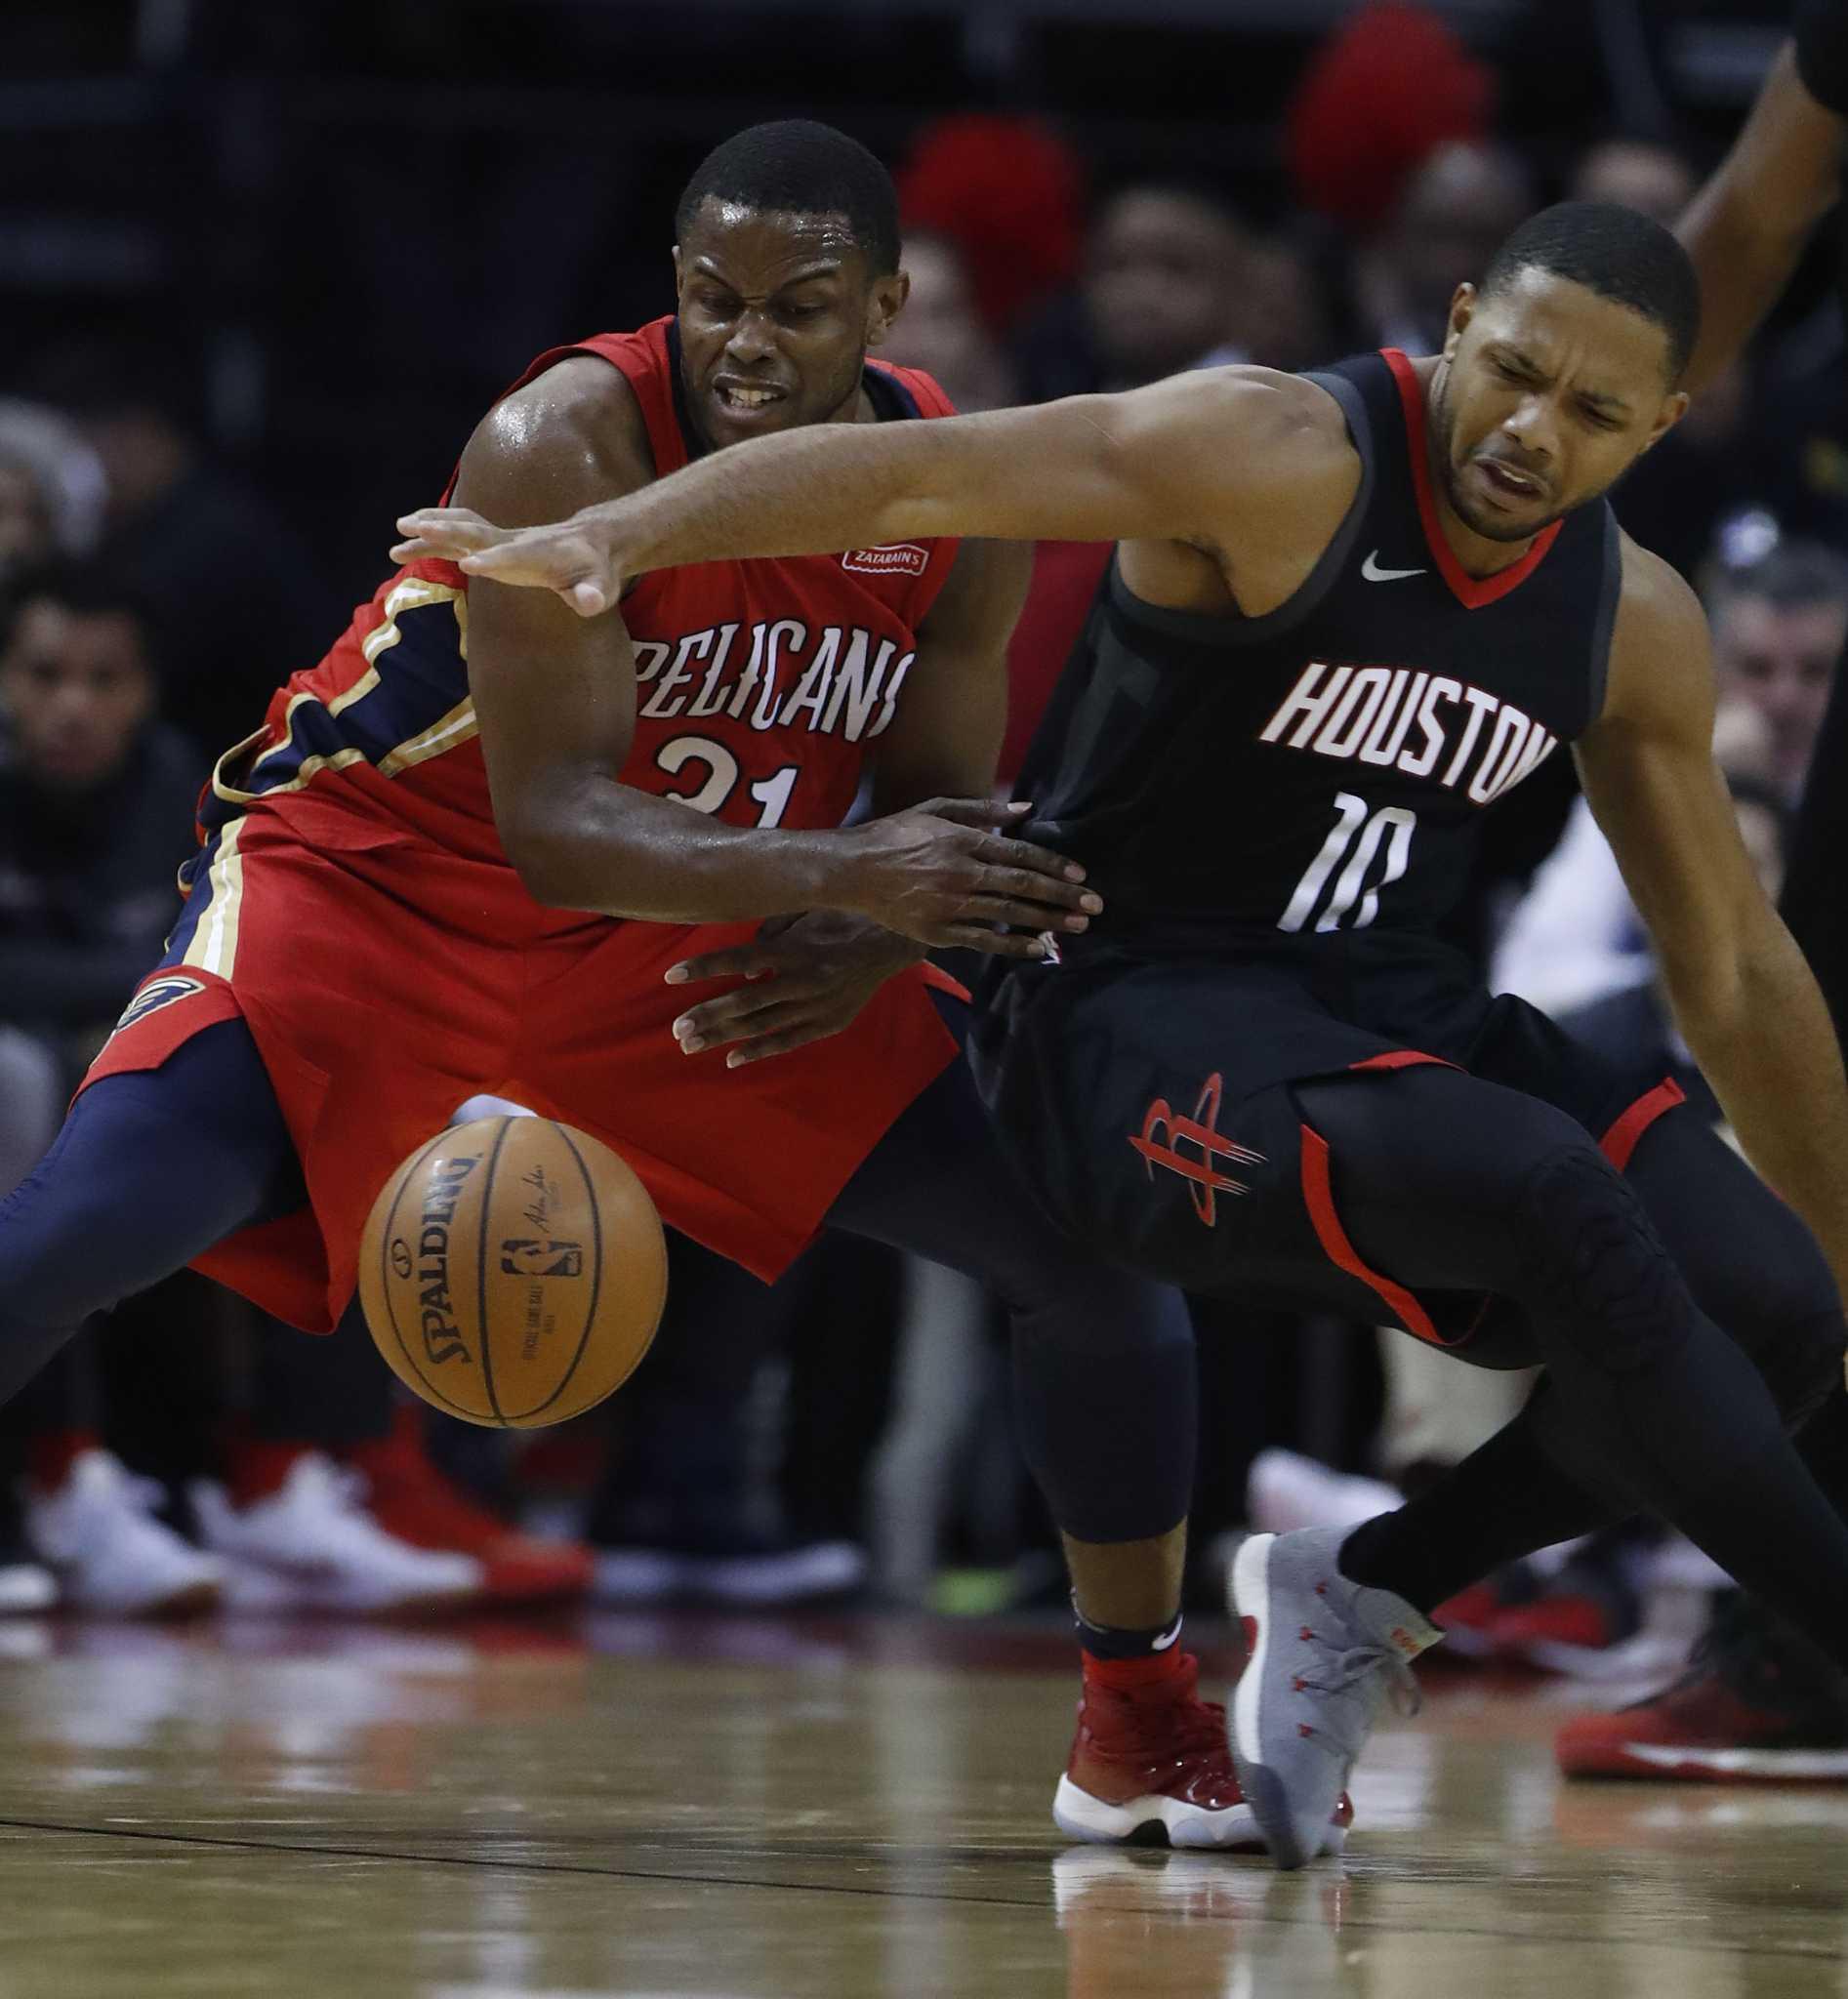 Find It Houston: Rockets' Eric Gordon Starting To Find His Shooting Rhythm